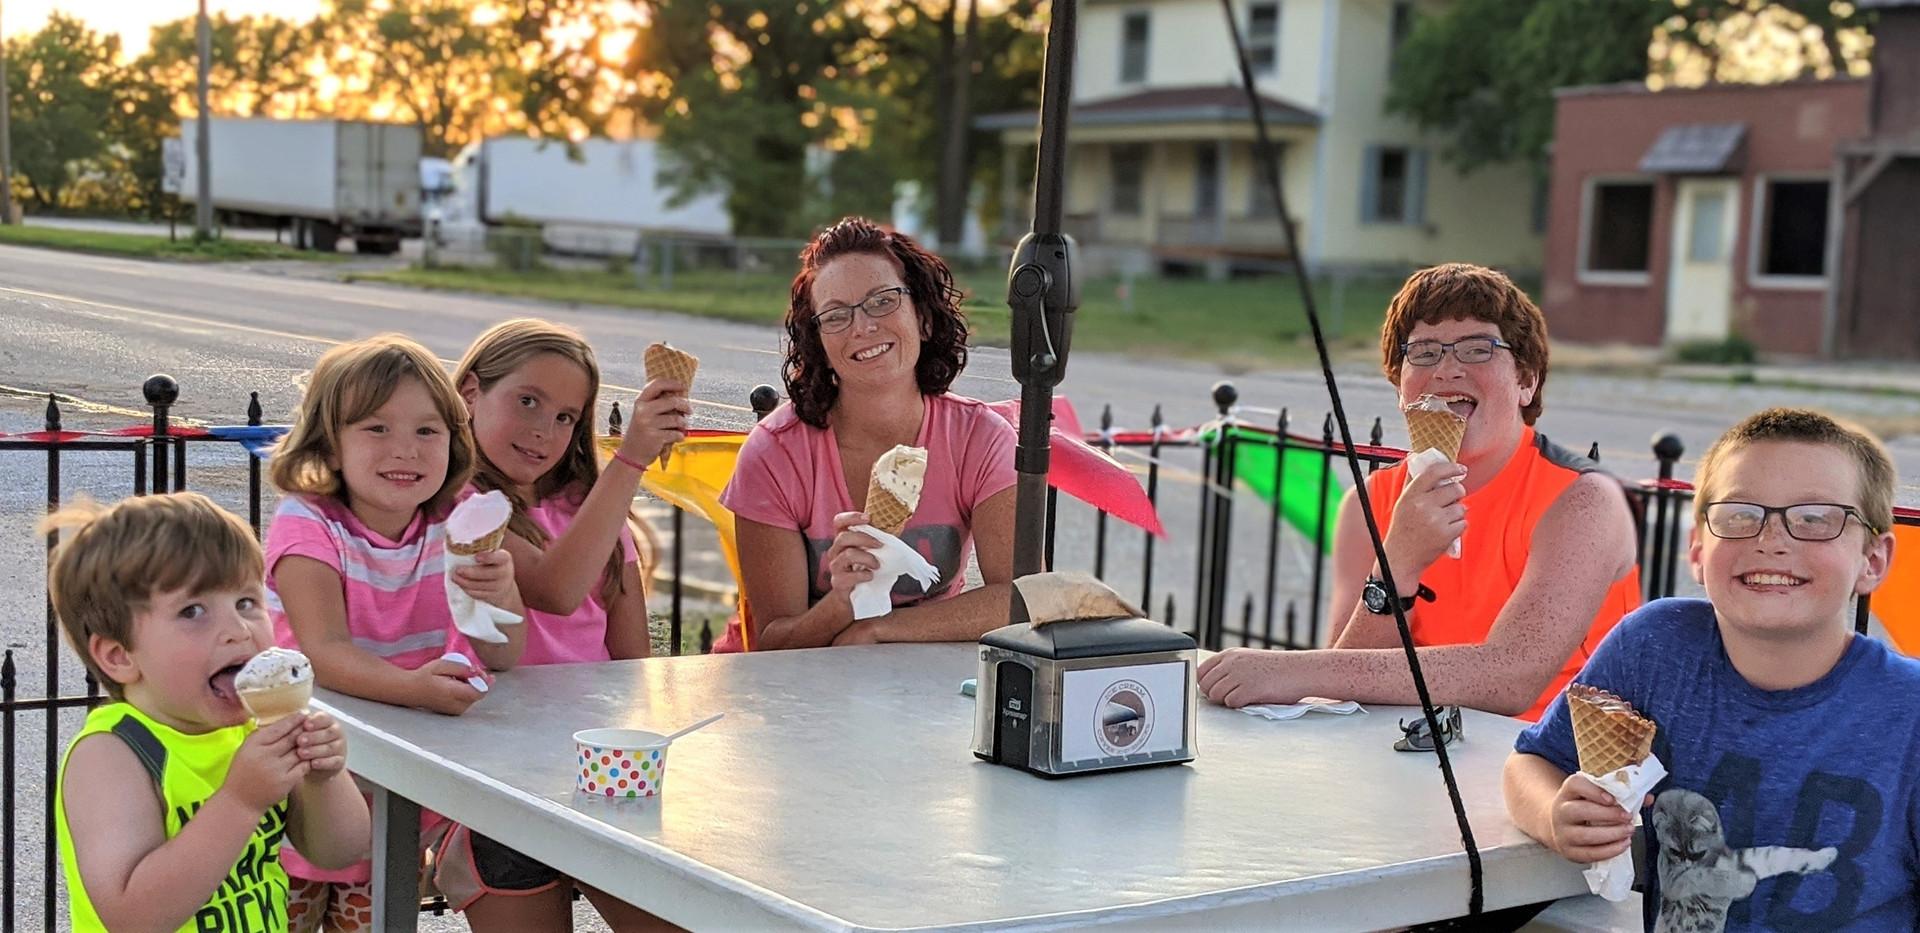 Family & Ice cream.jpg